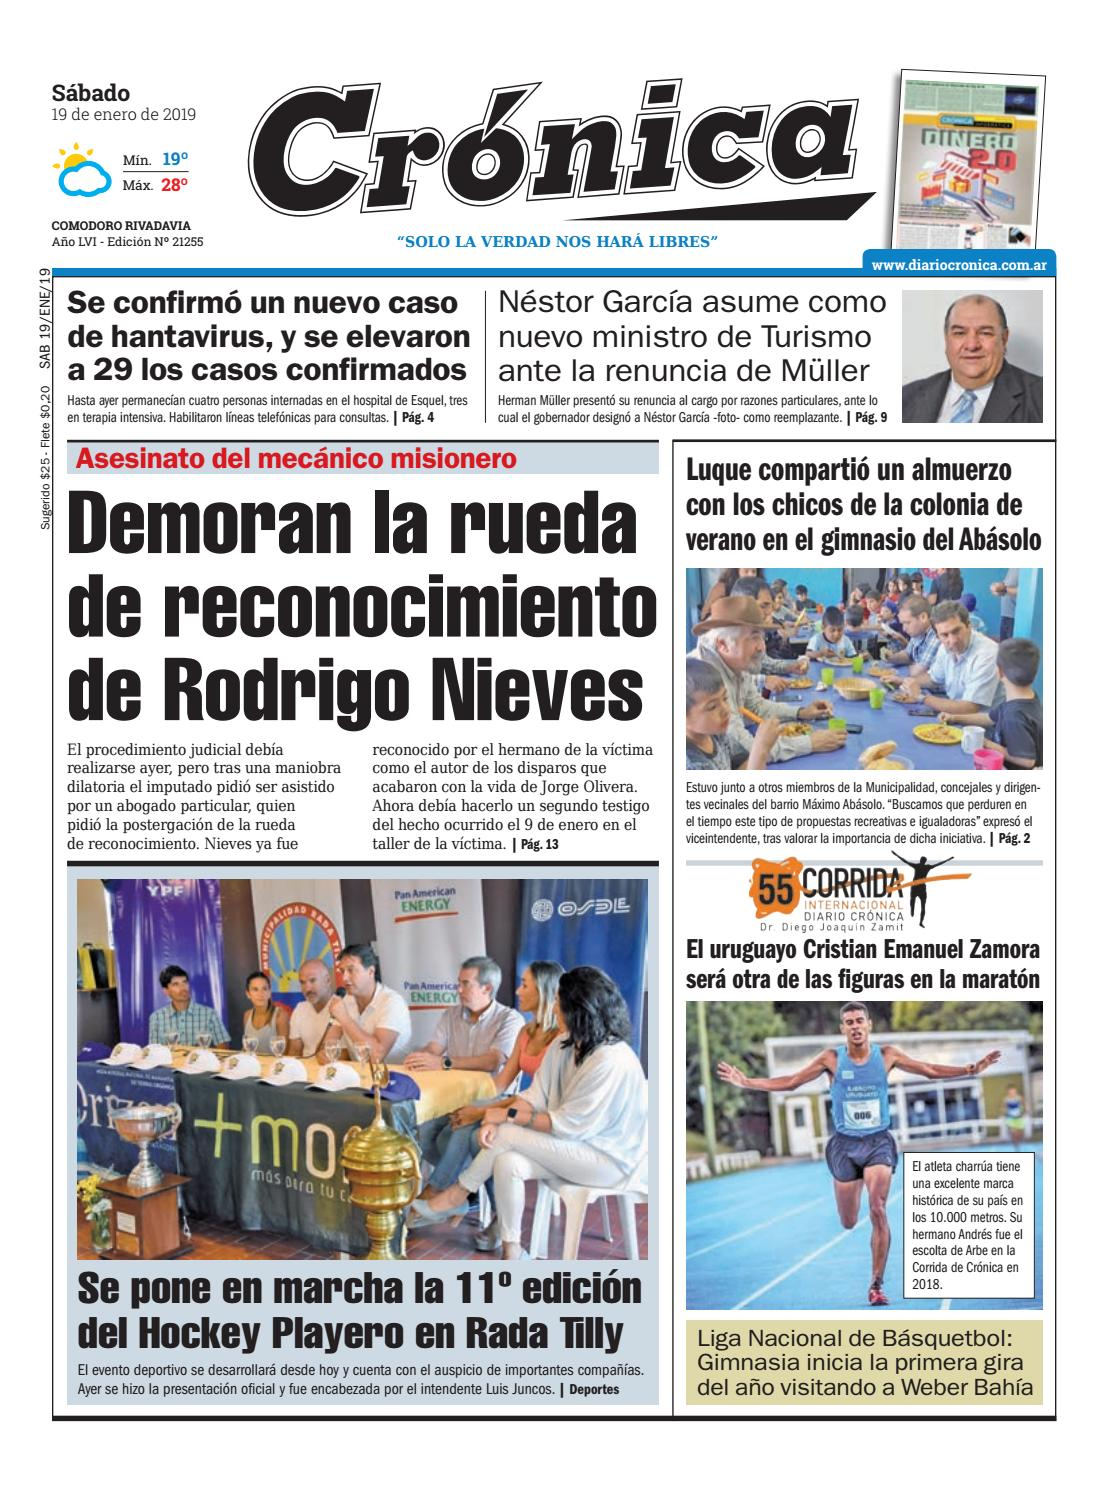 f7b3e8338a8 Diario cronica 19 01 2019 by Diario Crónica - issuu